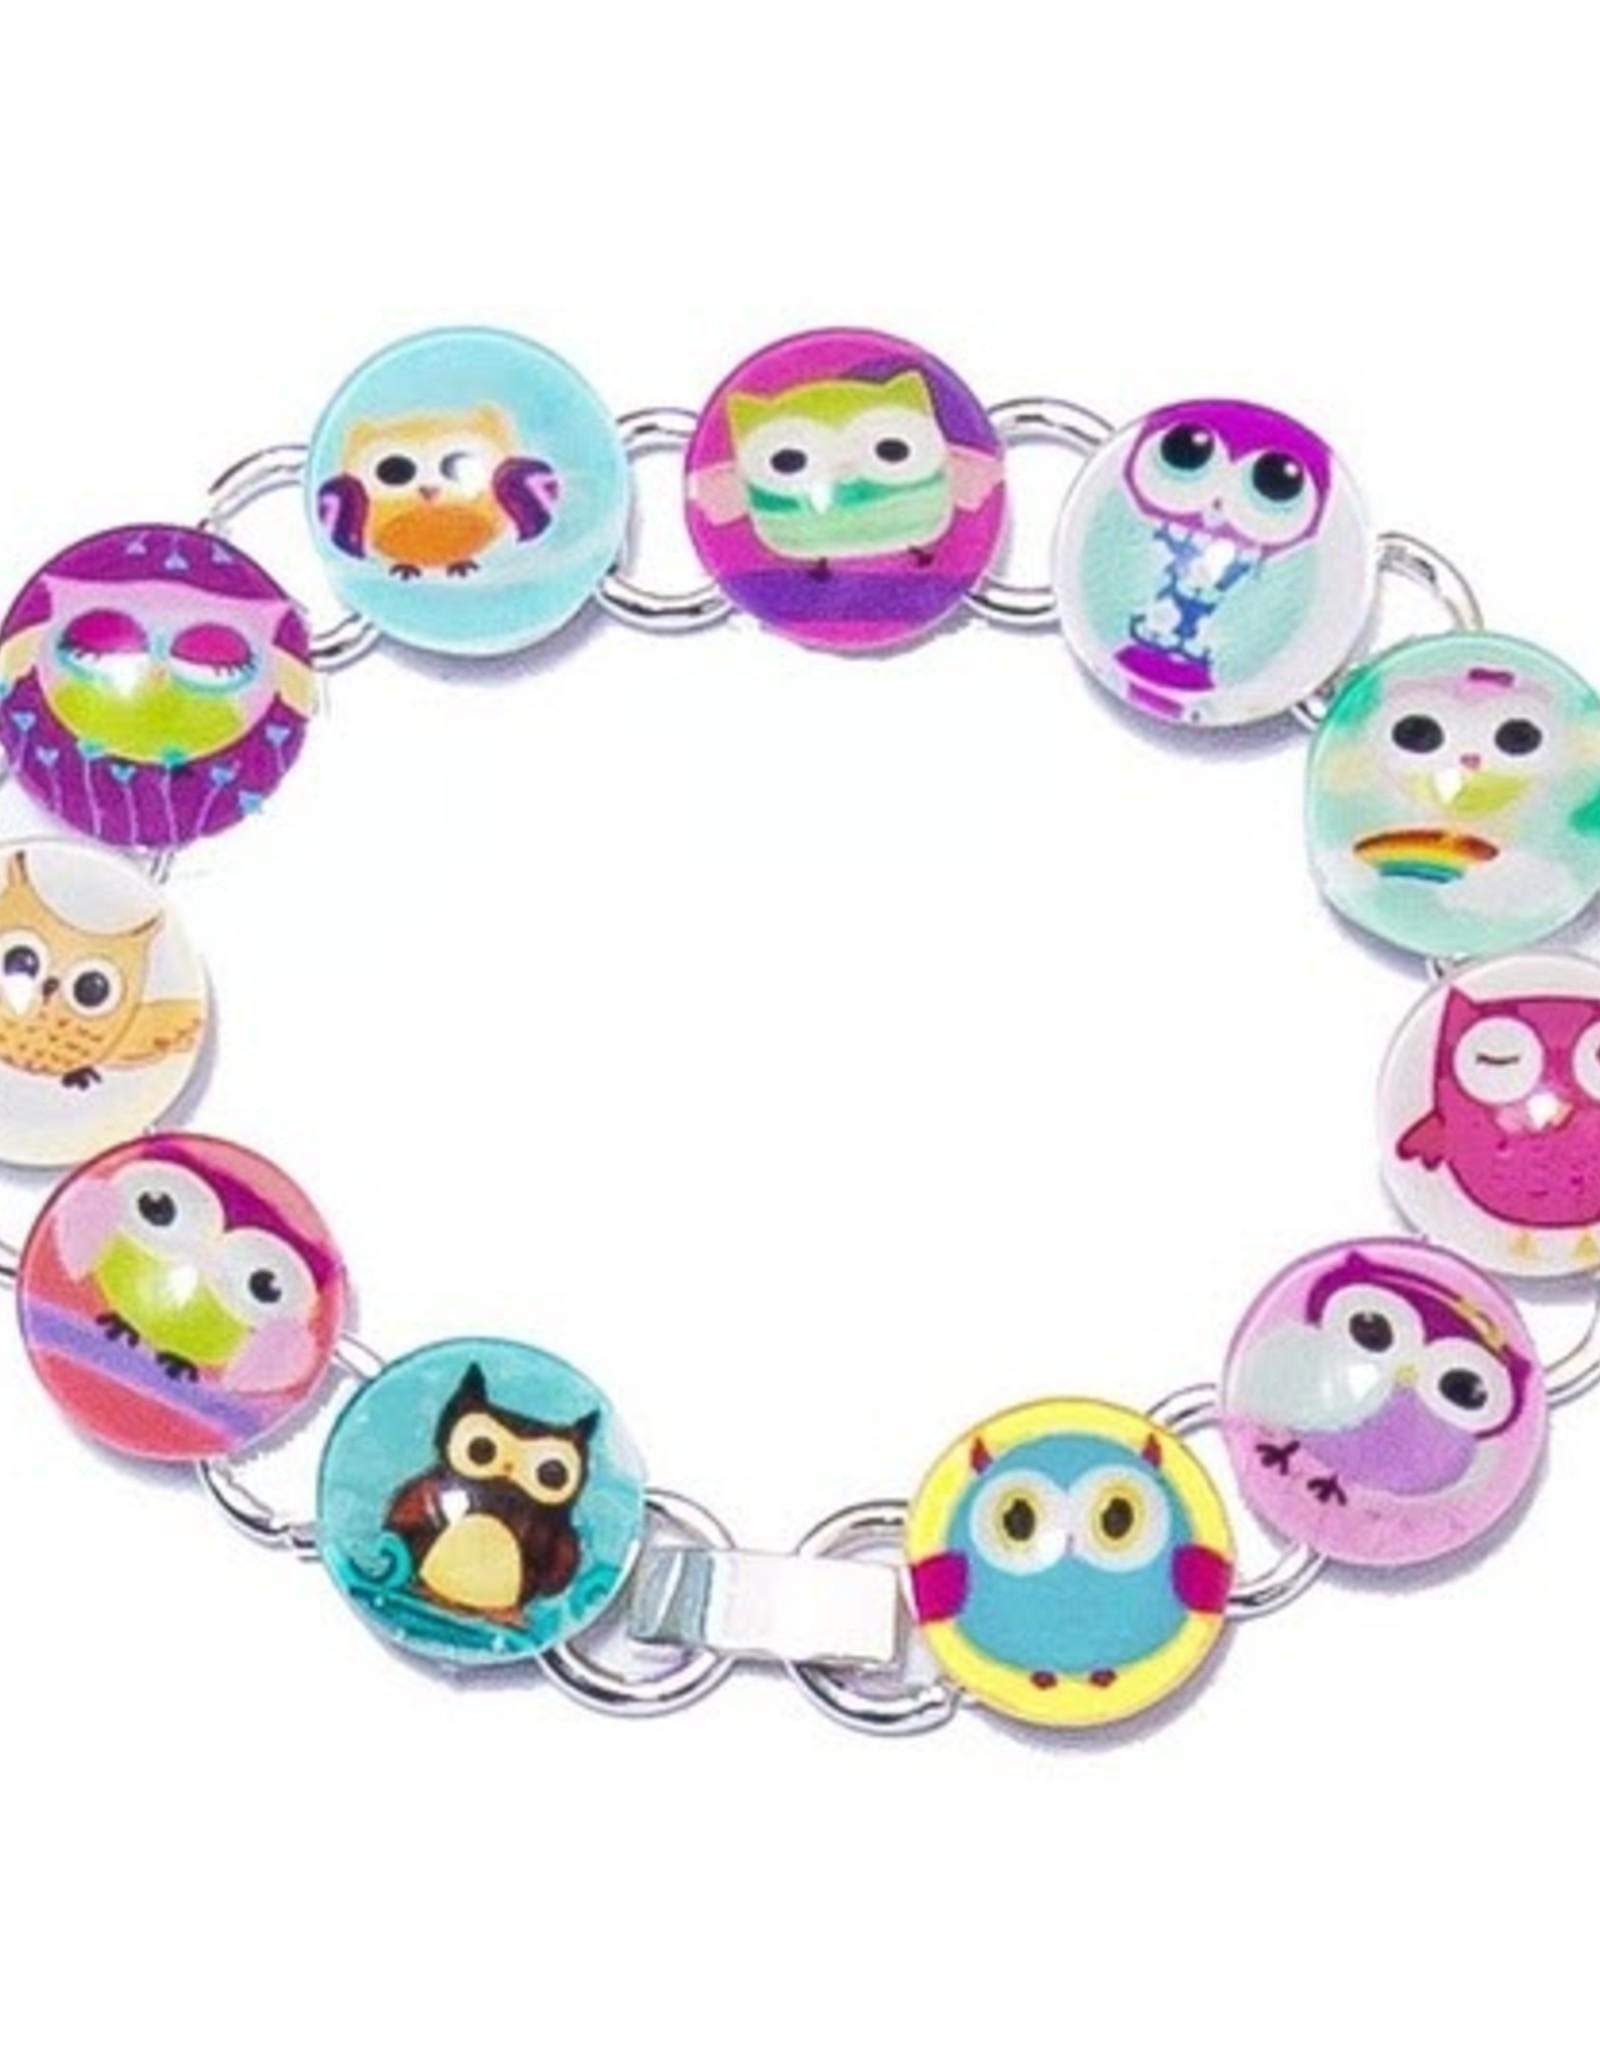 Huckleberry Huckleberry - Bracelet Set Owl